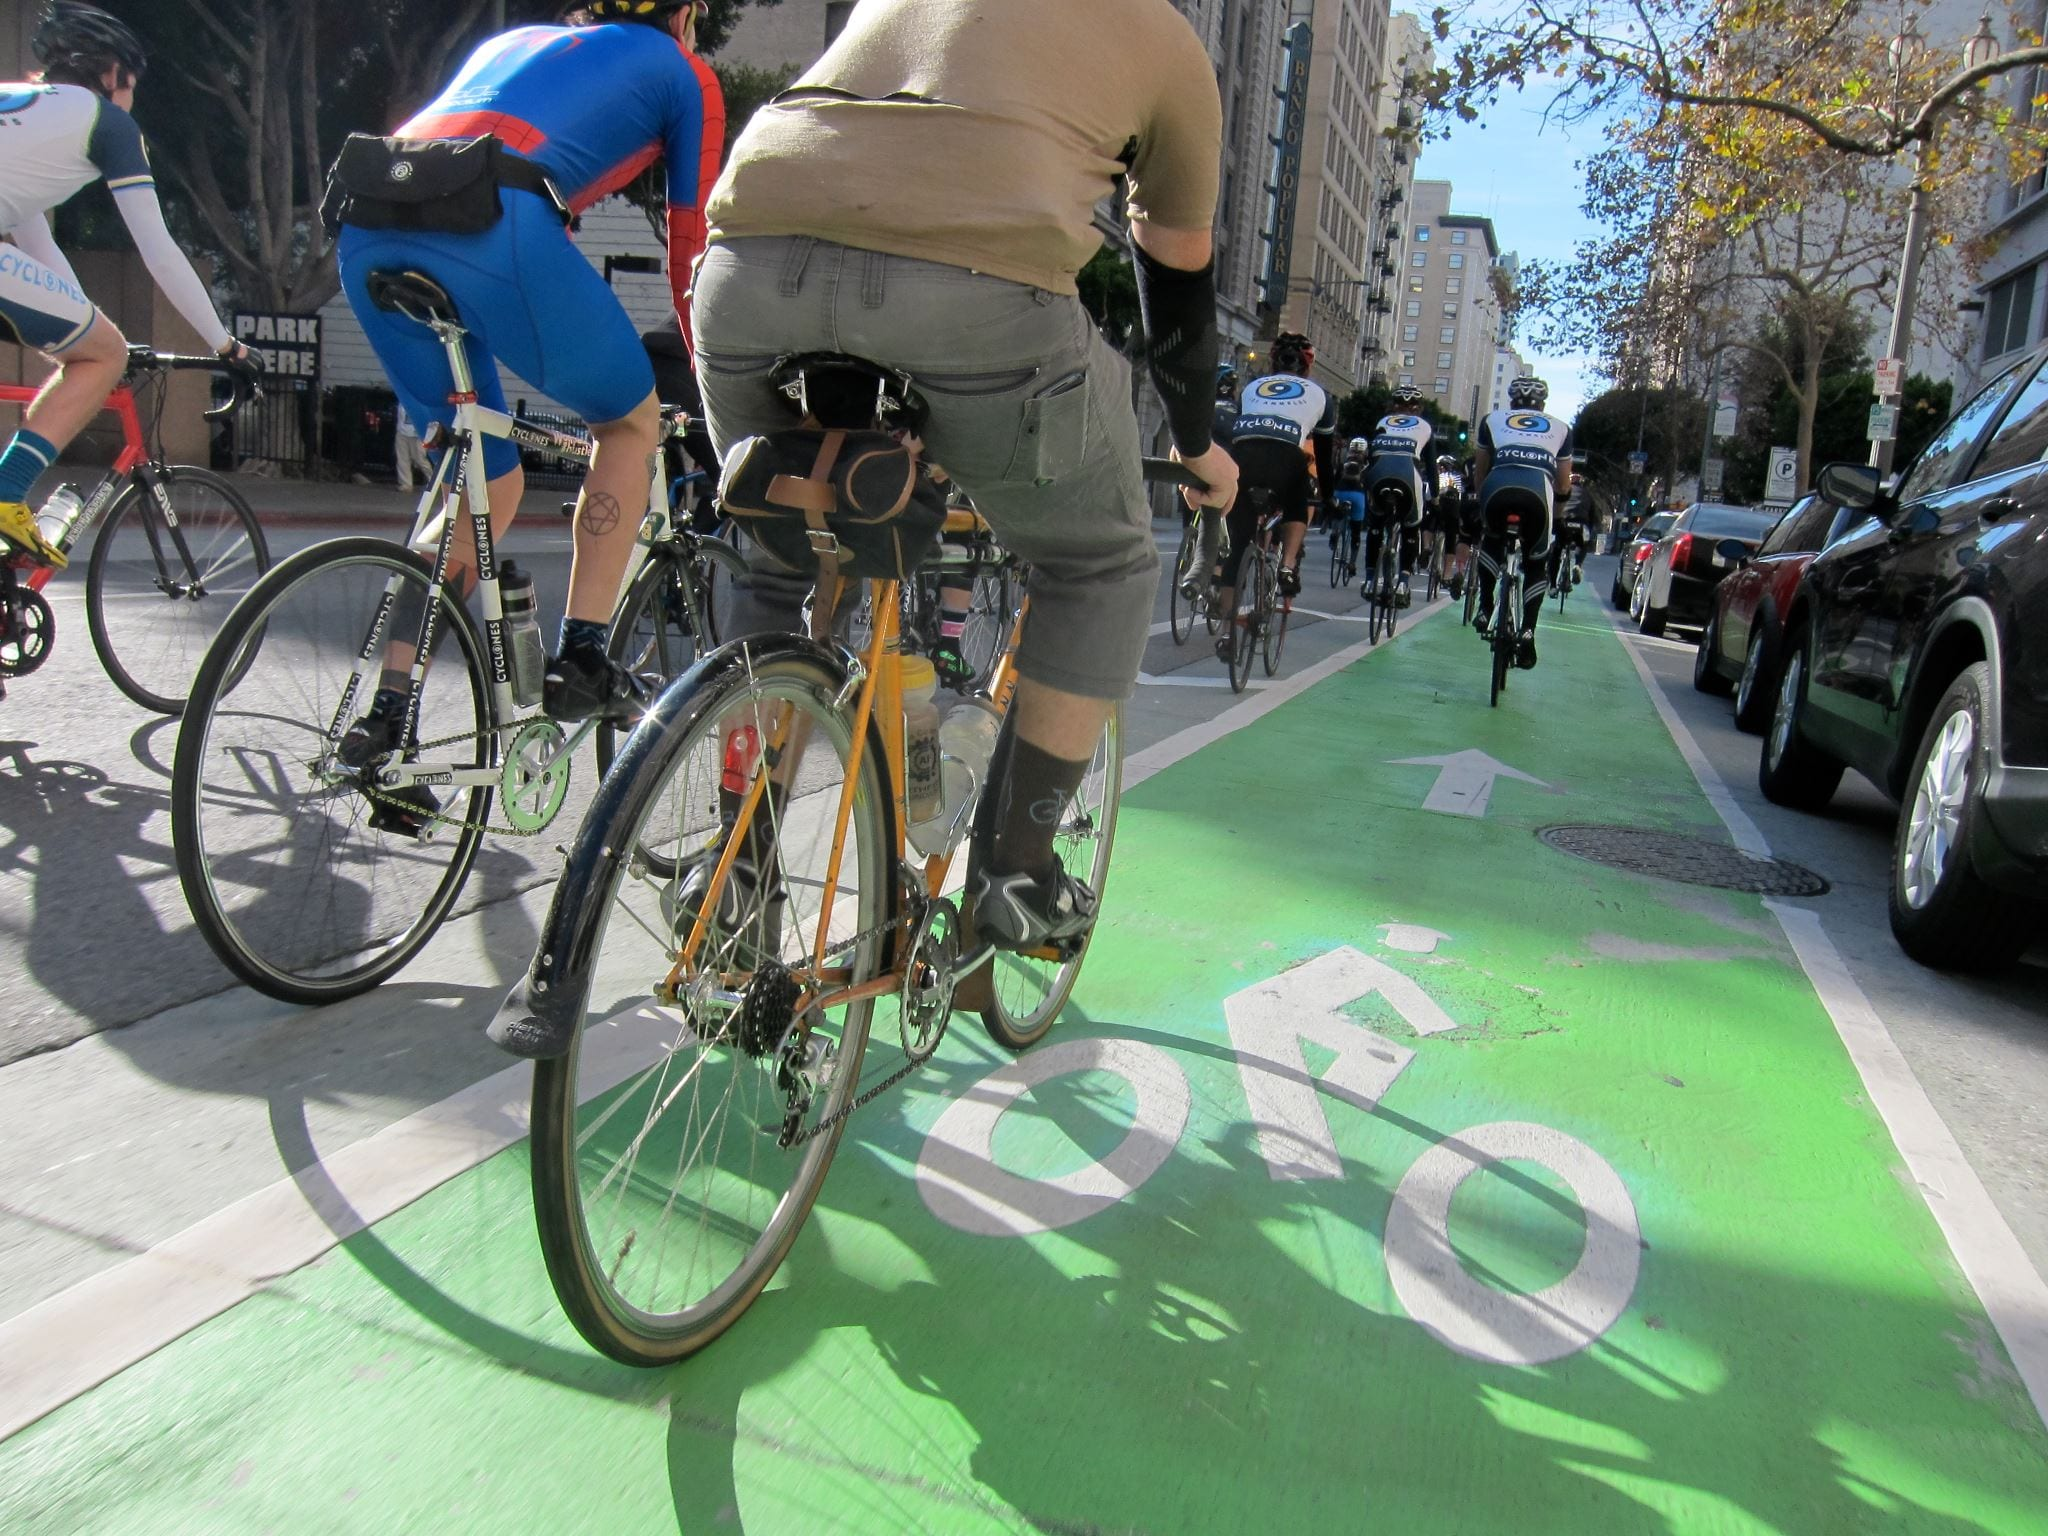 Cyclists using Spring St.'s green bike lane. Photo by Jances Certeza.